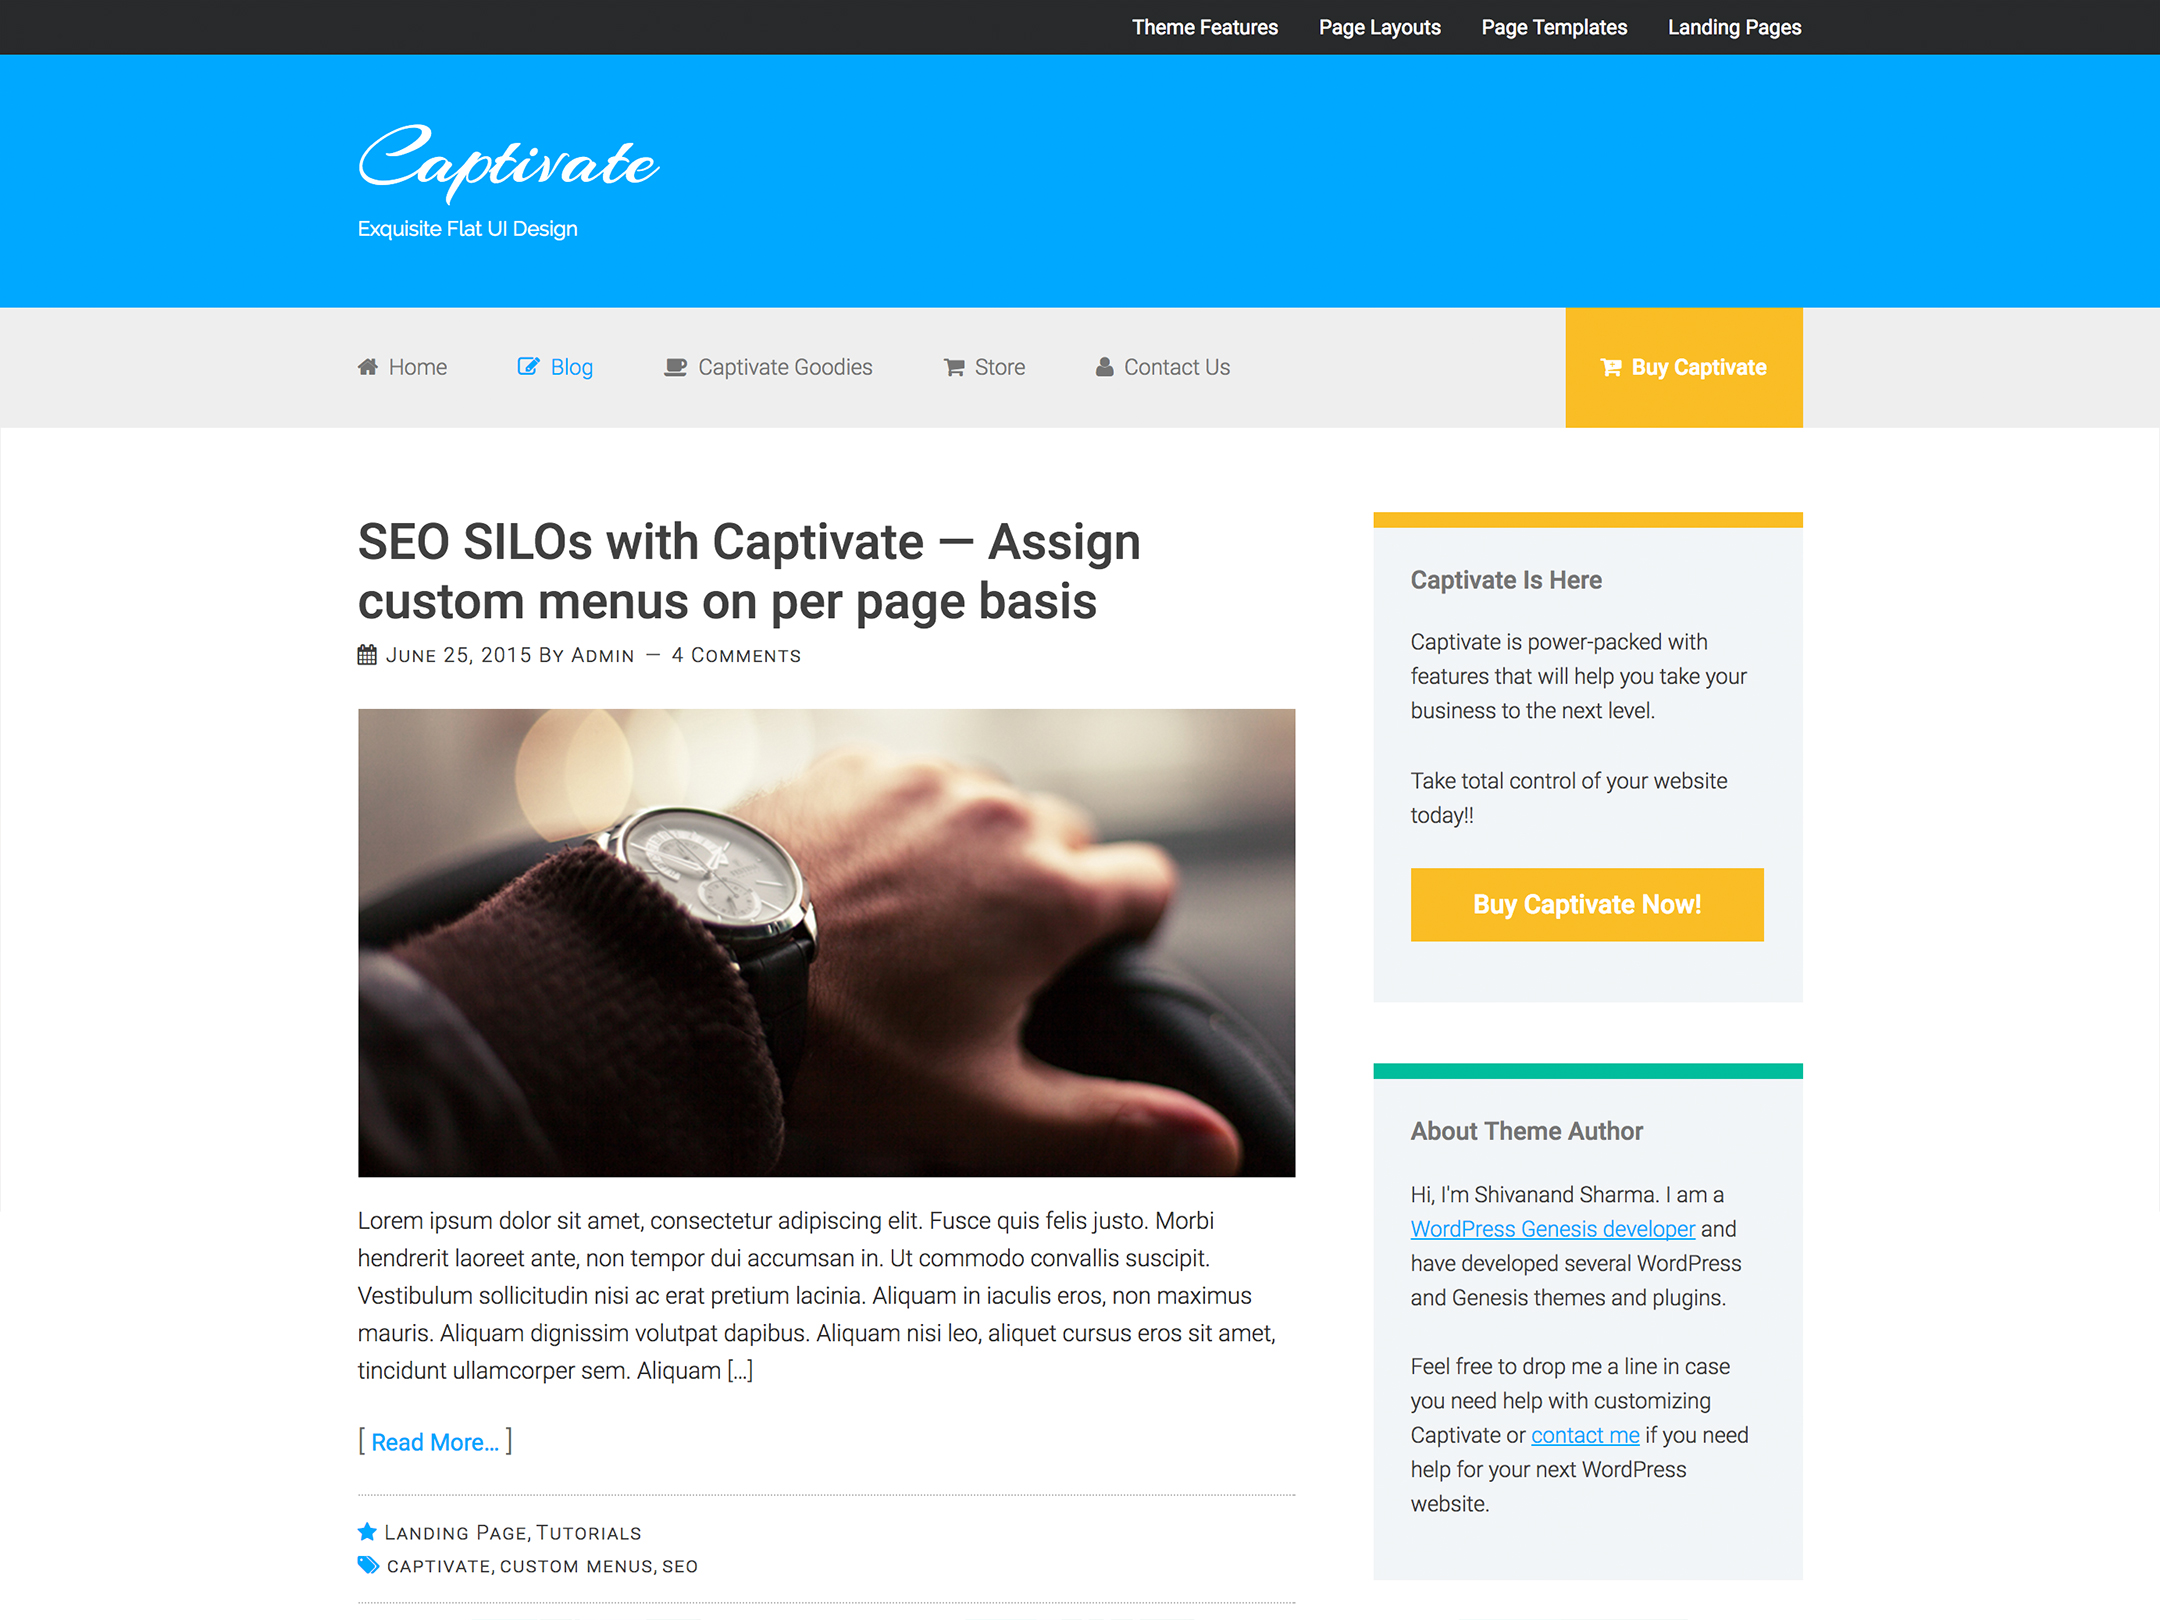 Theme Development — Captivate (Premium Theme)